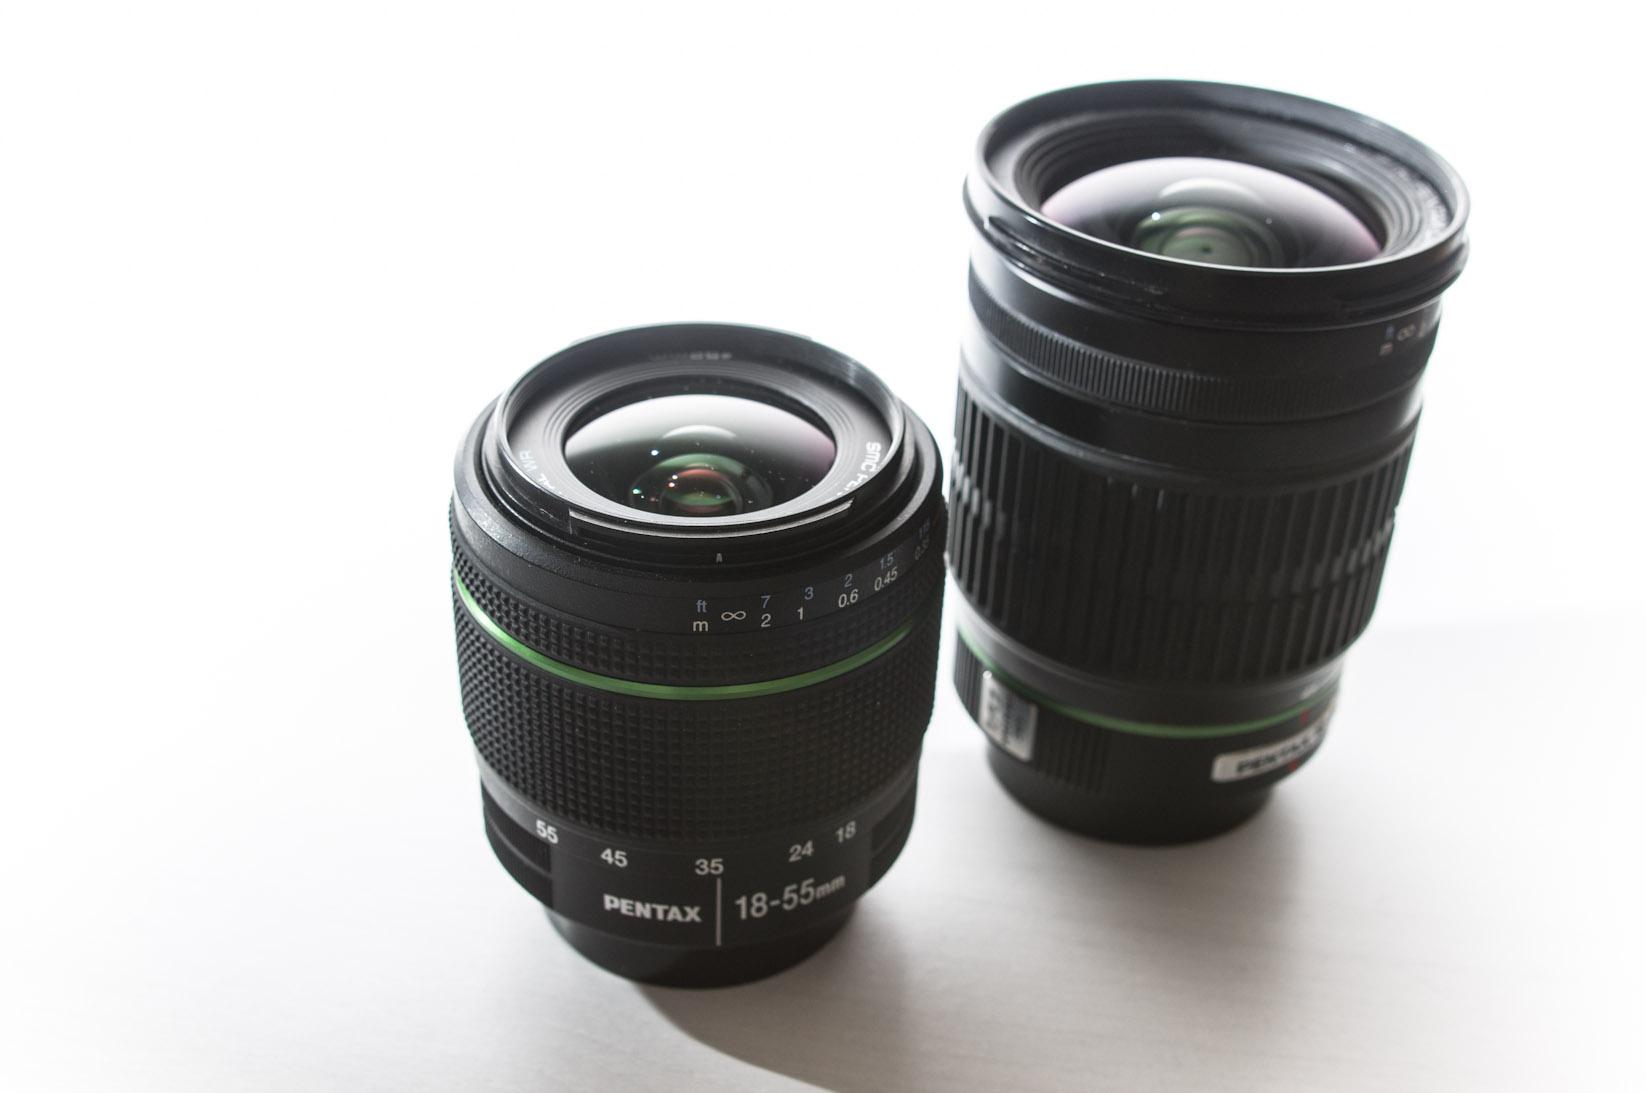 SMC Pentax 16-45 f/4.0 – recenze